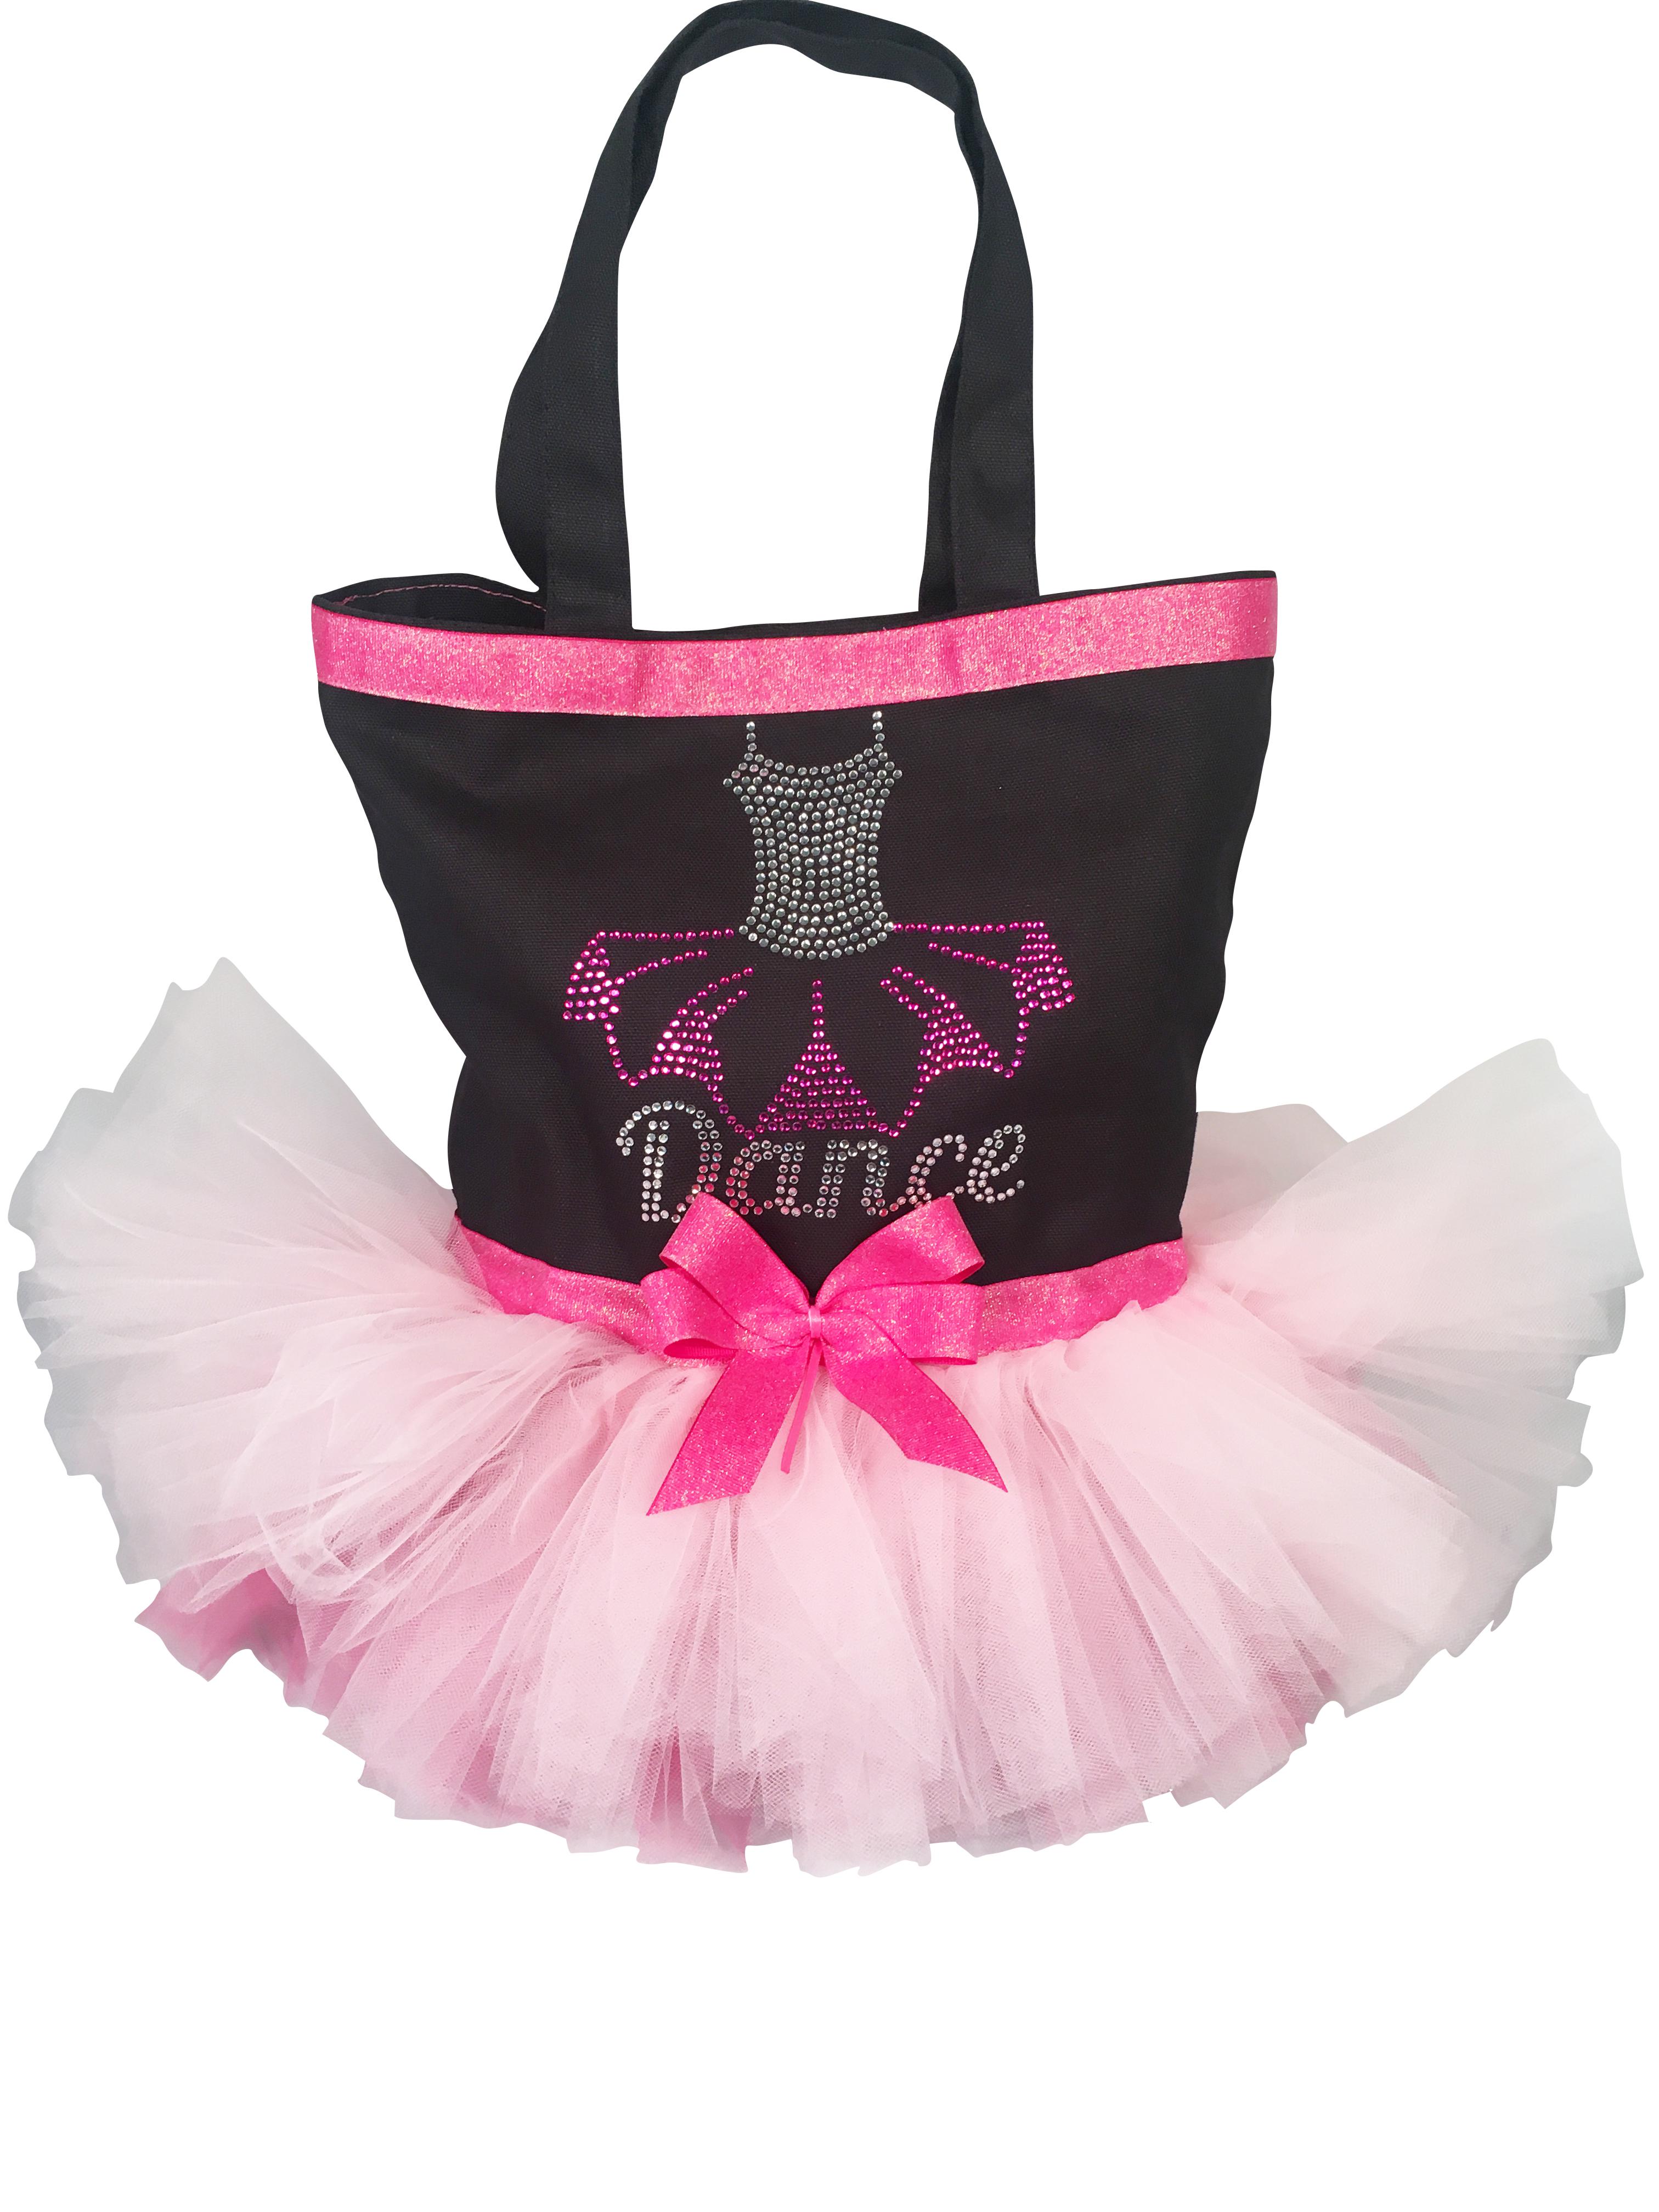 glitzy pink tutu bag